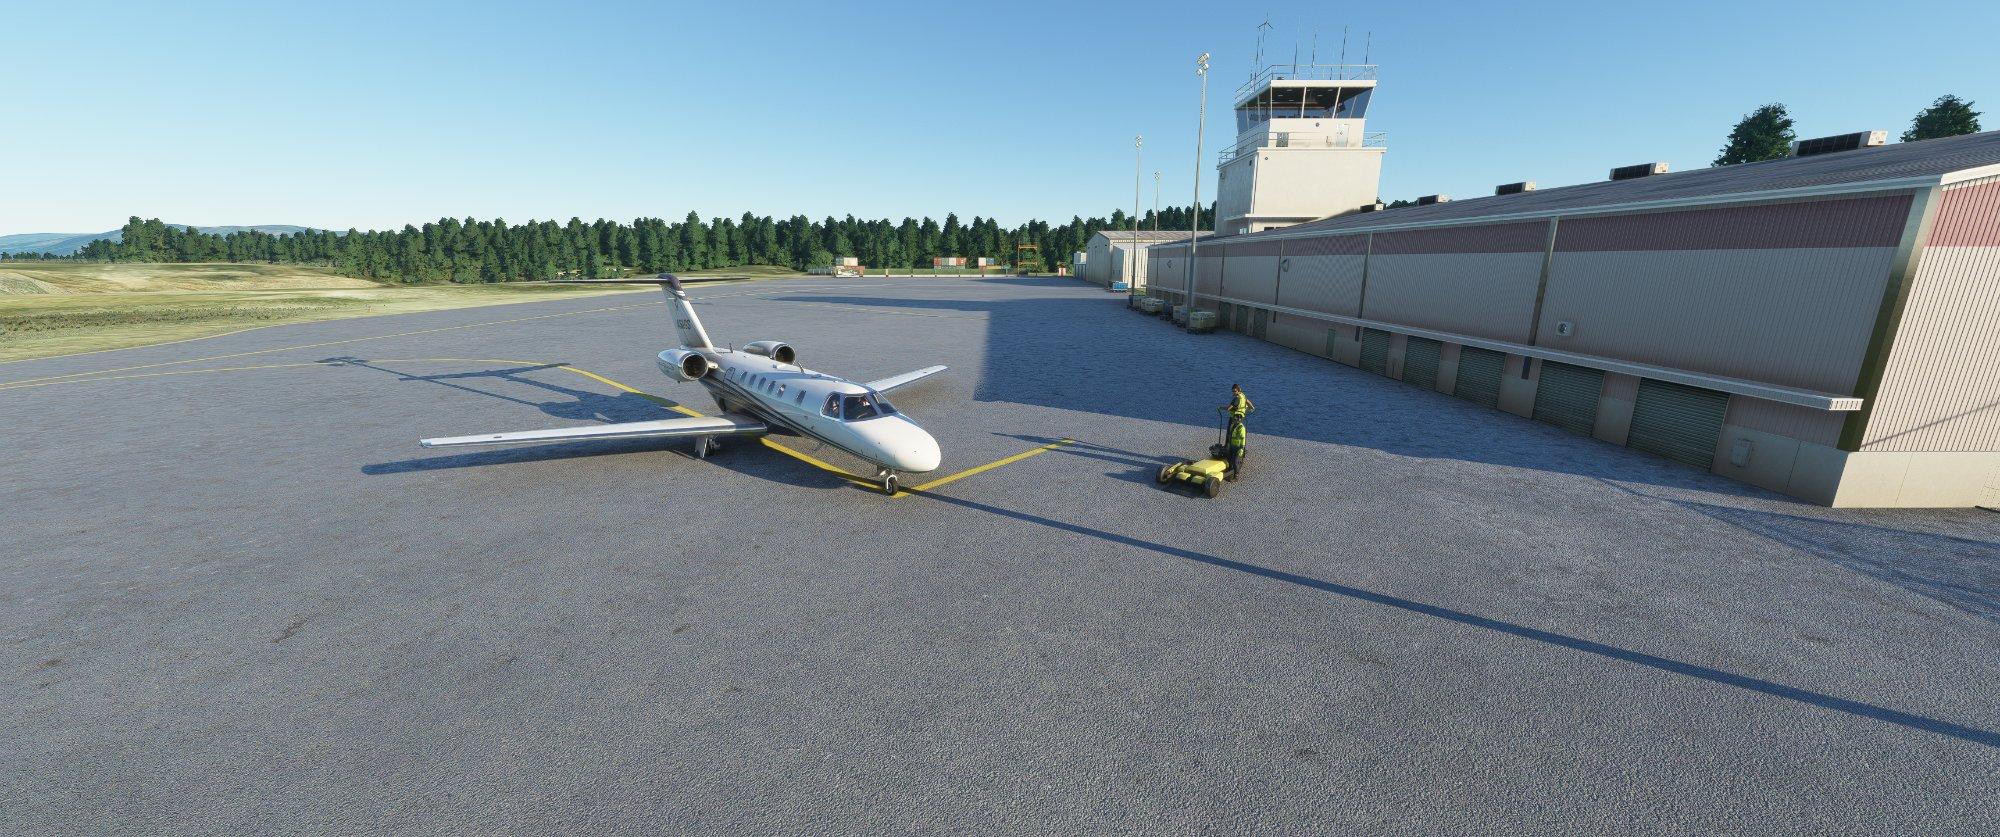 Microsoft Flight Simulator Screenshot 2020.11.01 - 12.04.42.57.jpg